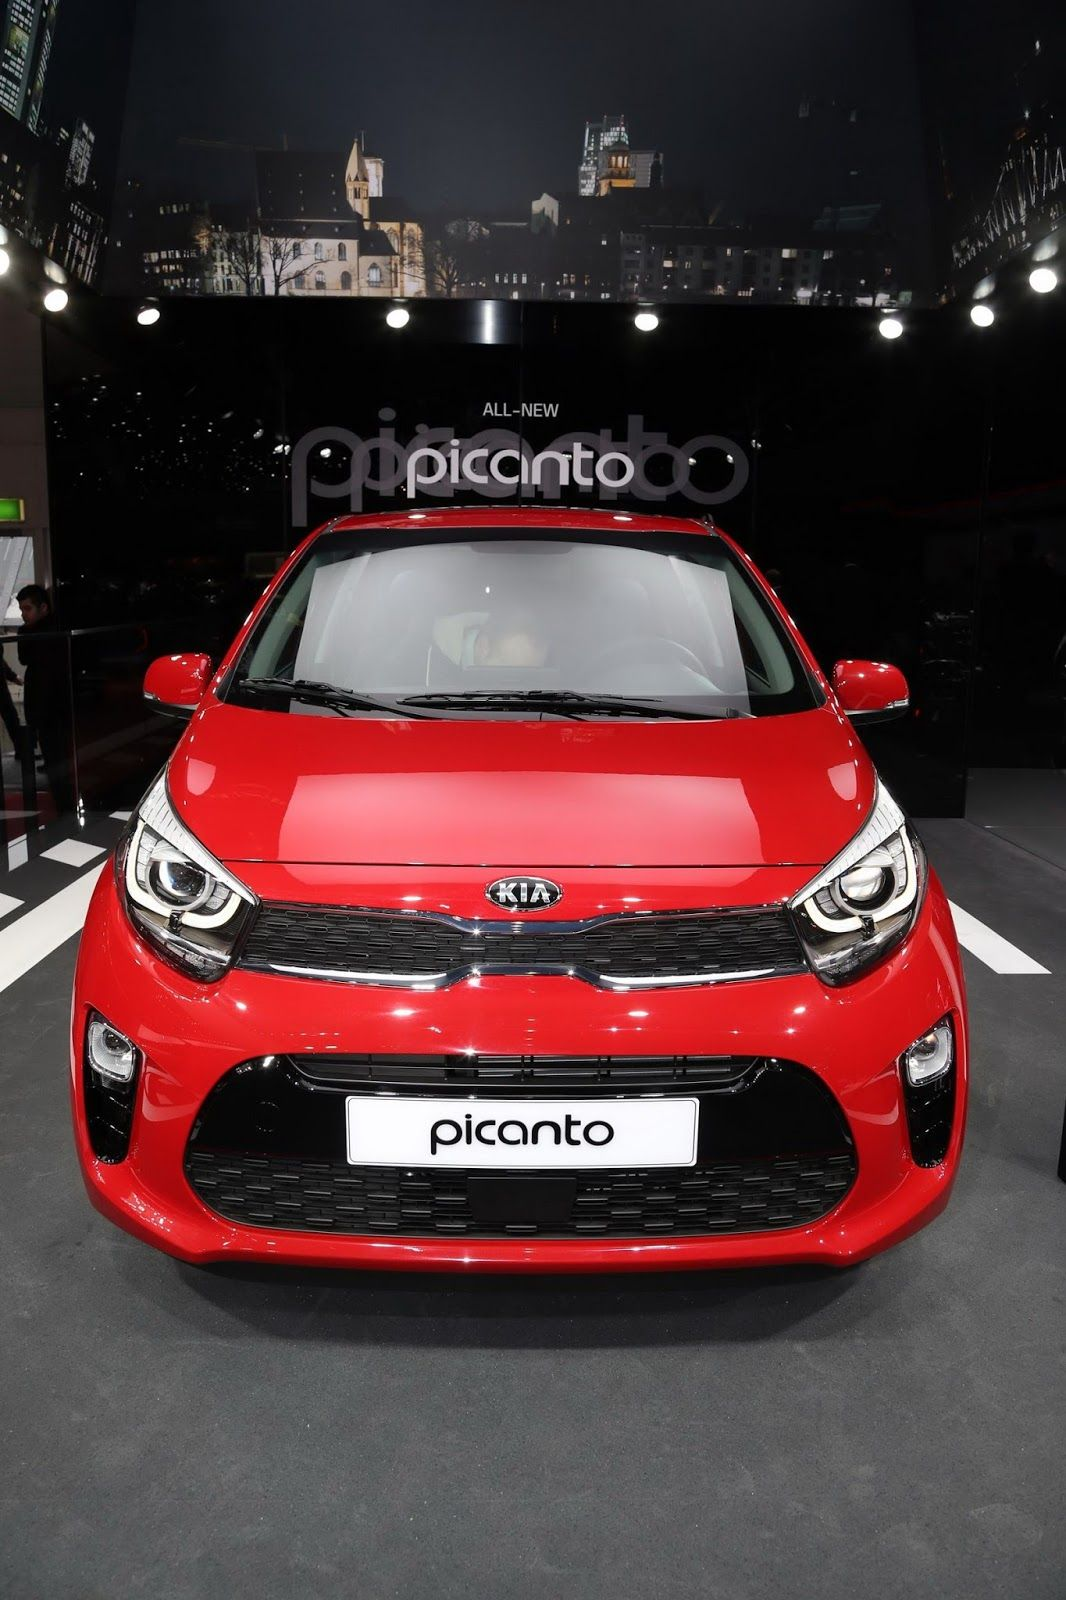 Pin By New Cars Models On Kia Pinterest Kia Picanto Small Cars